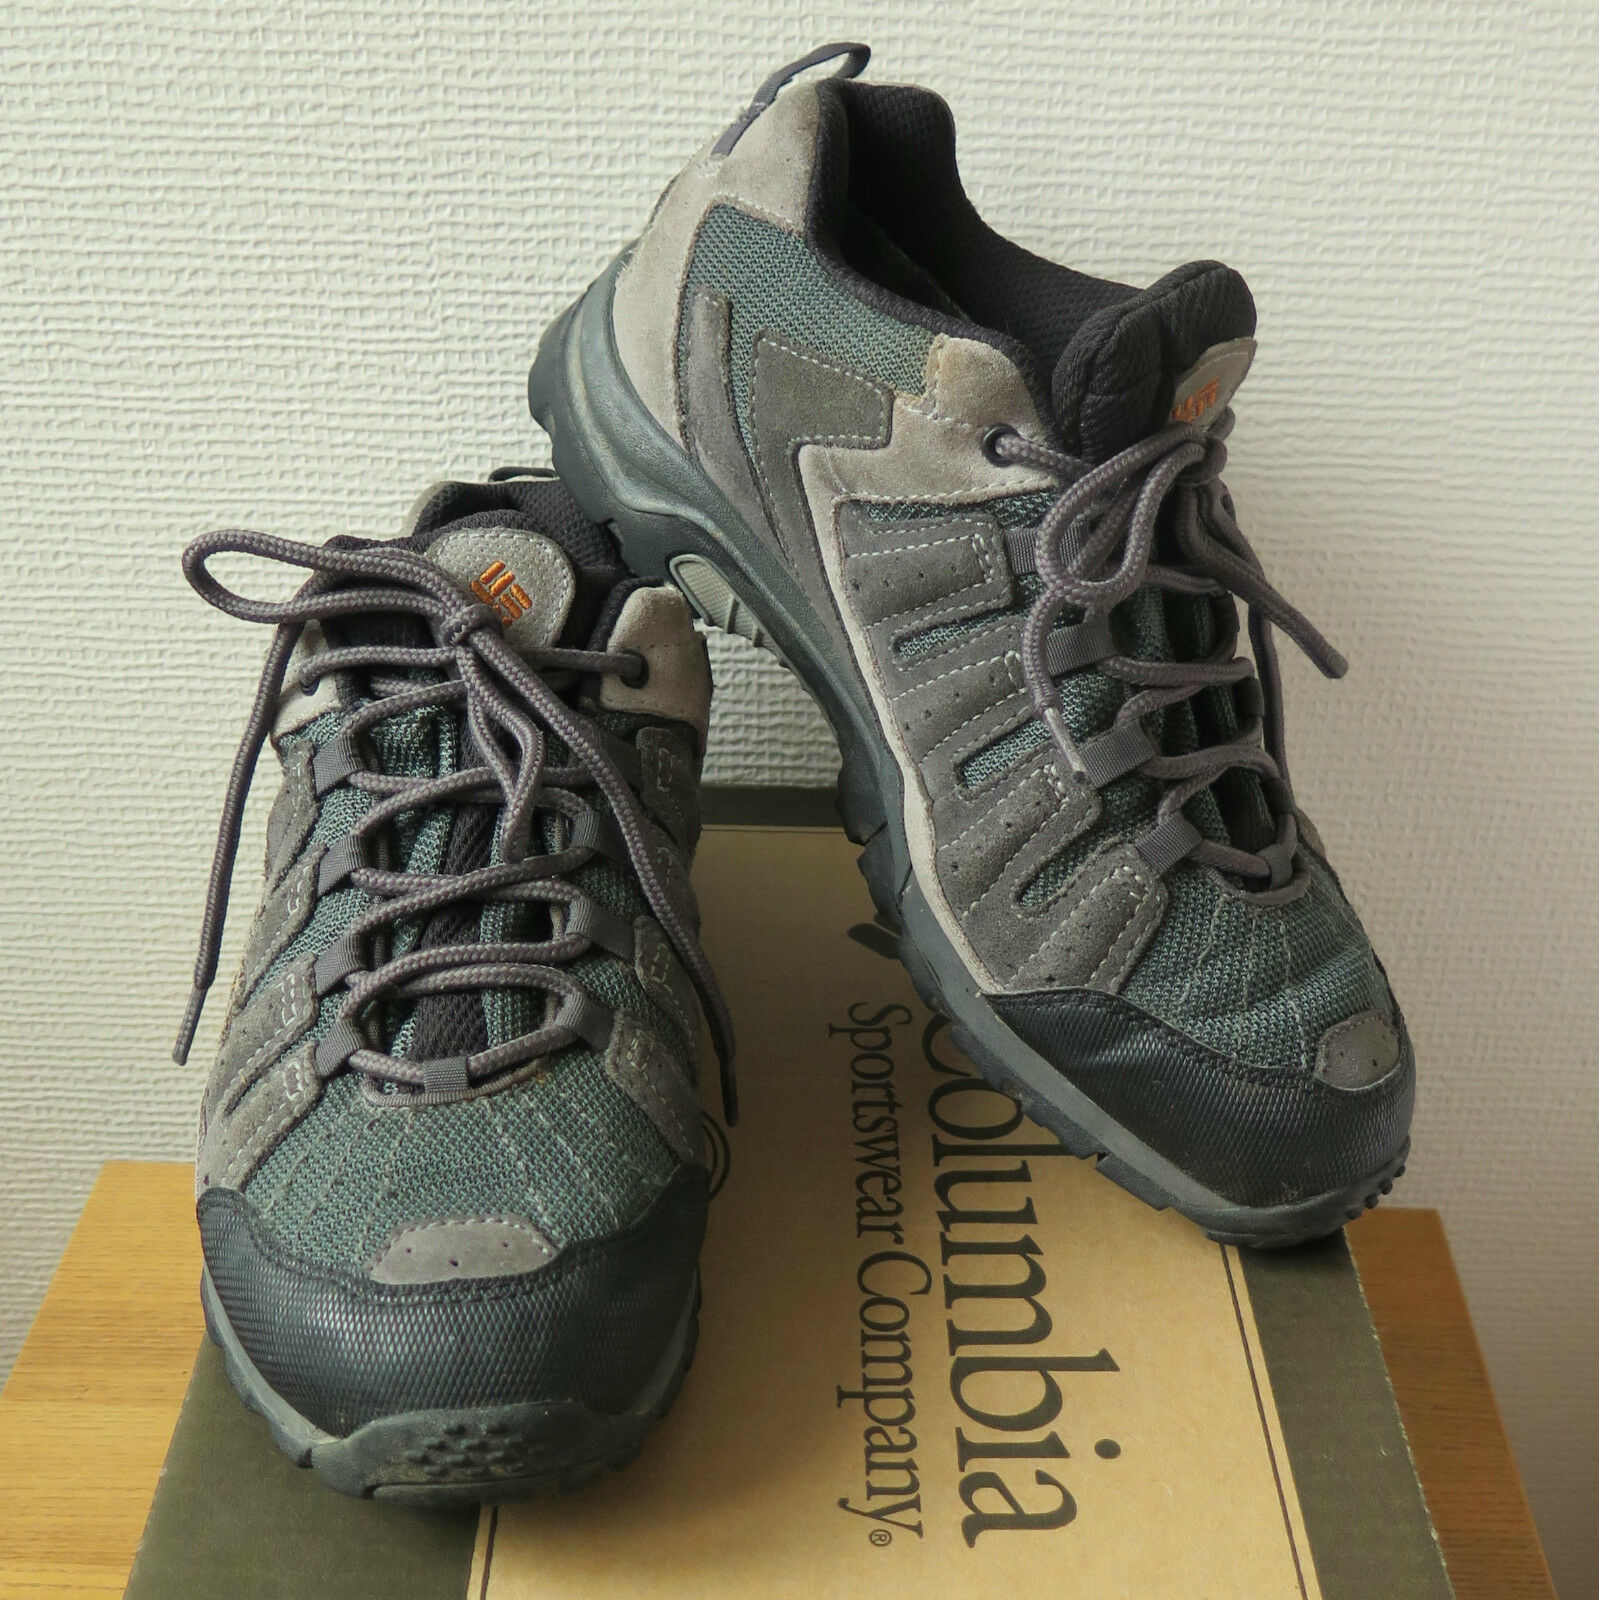 COLUMBIA grau Herren WALKING HIKING Schuhe | Gore-Tex | BM 3184-028 | EU 41 UK 7